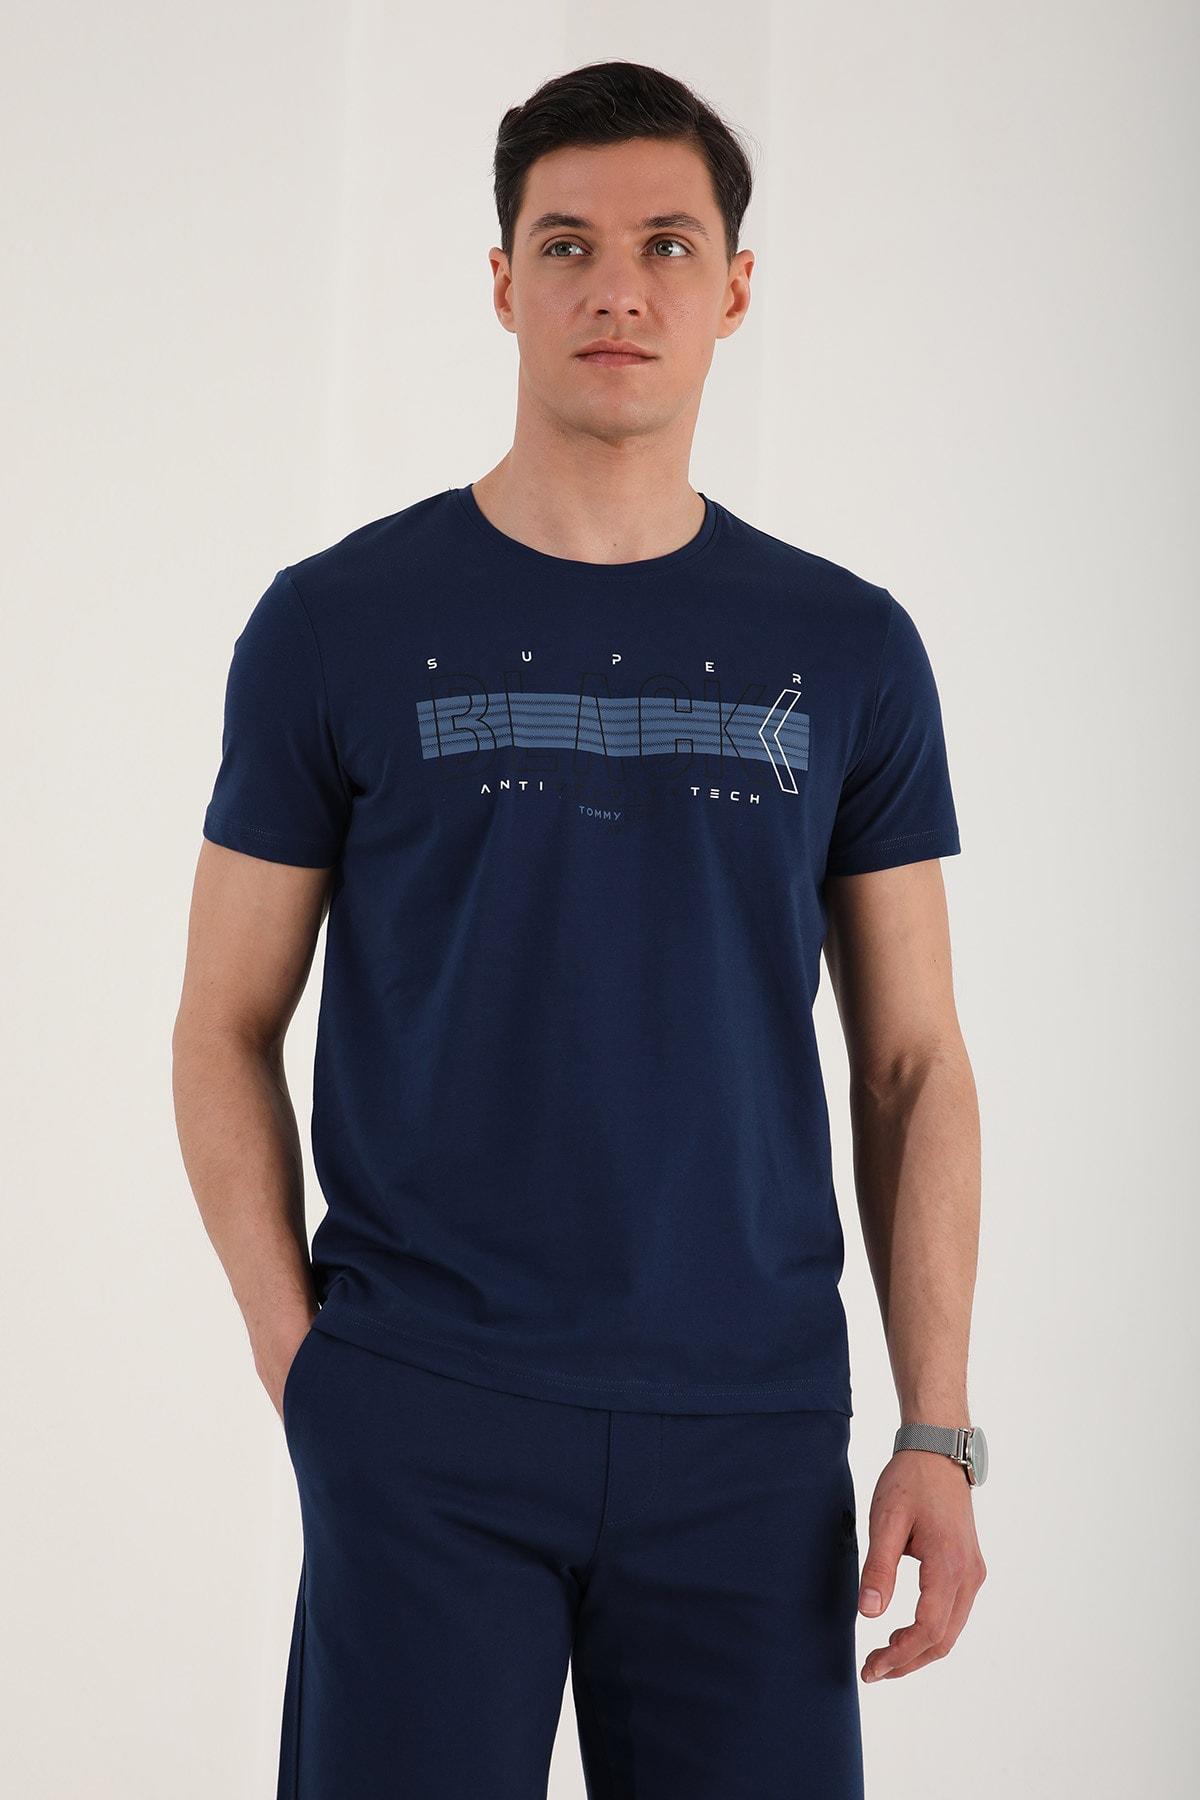 Erkek Black Yazı Baskılı Rahat Kalıp O Yaka T-shirt - 87954